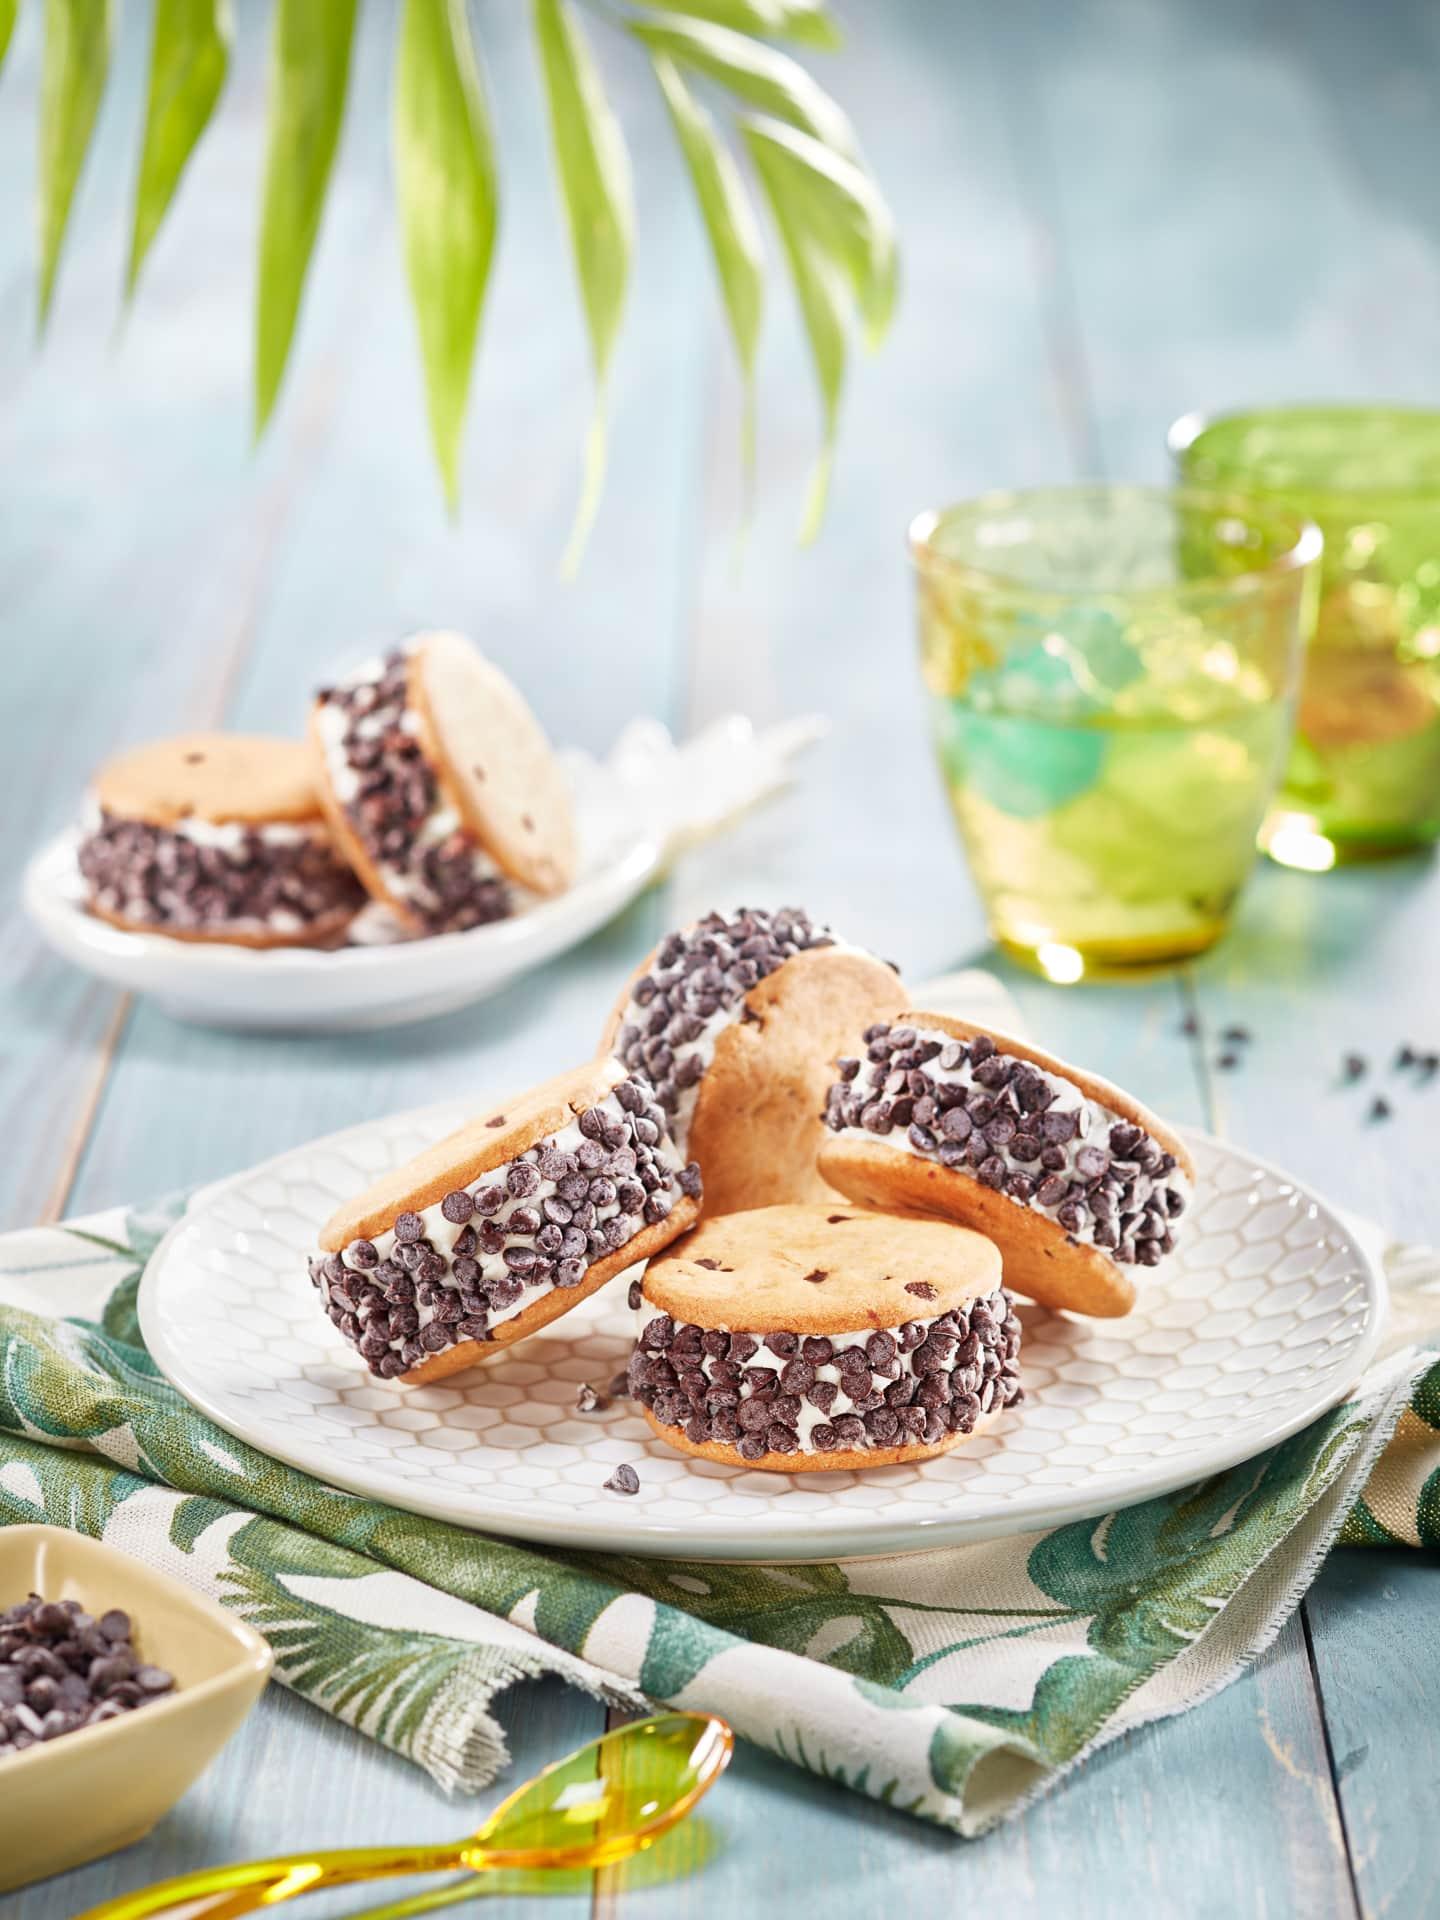 biscotto gelato fotografo food milano venezia verona